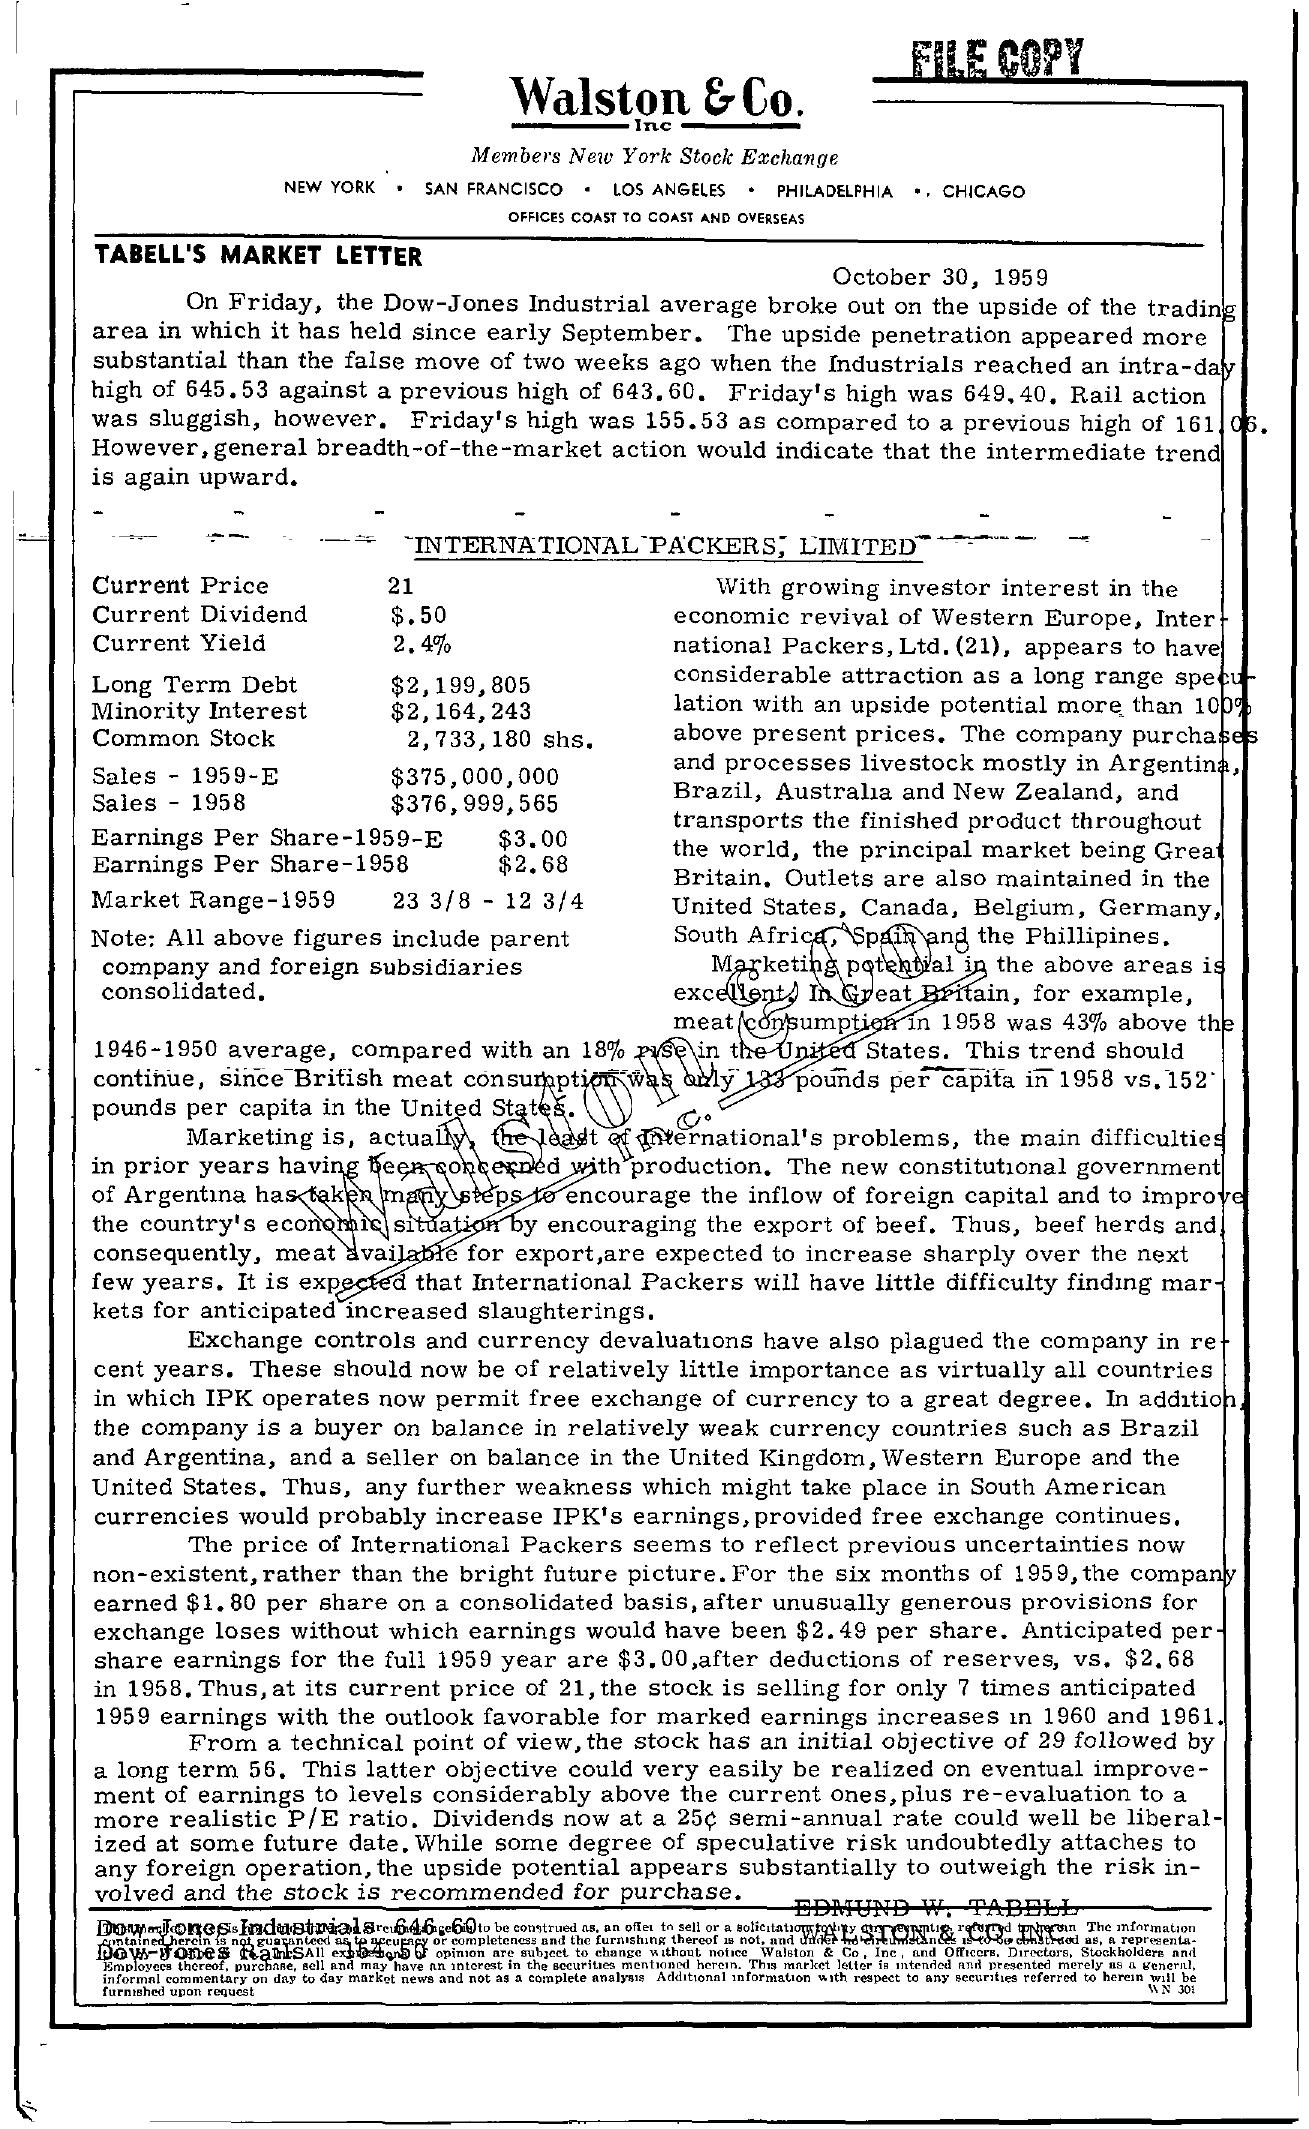 Tabell's Market Letter - October 30, 1959